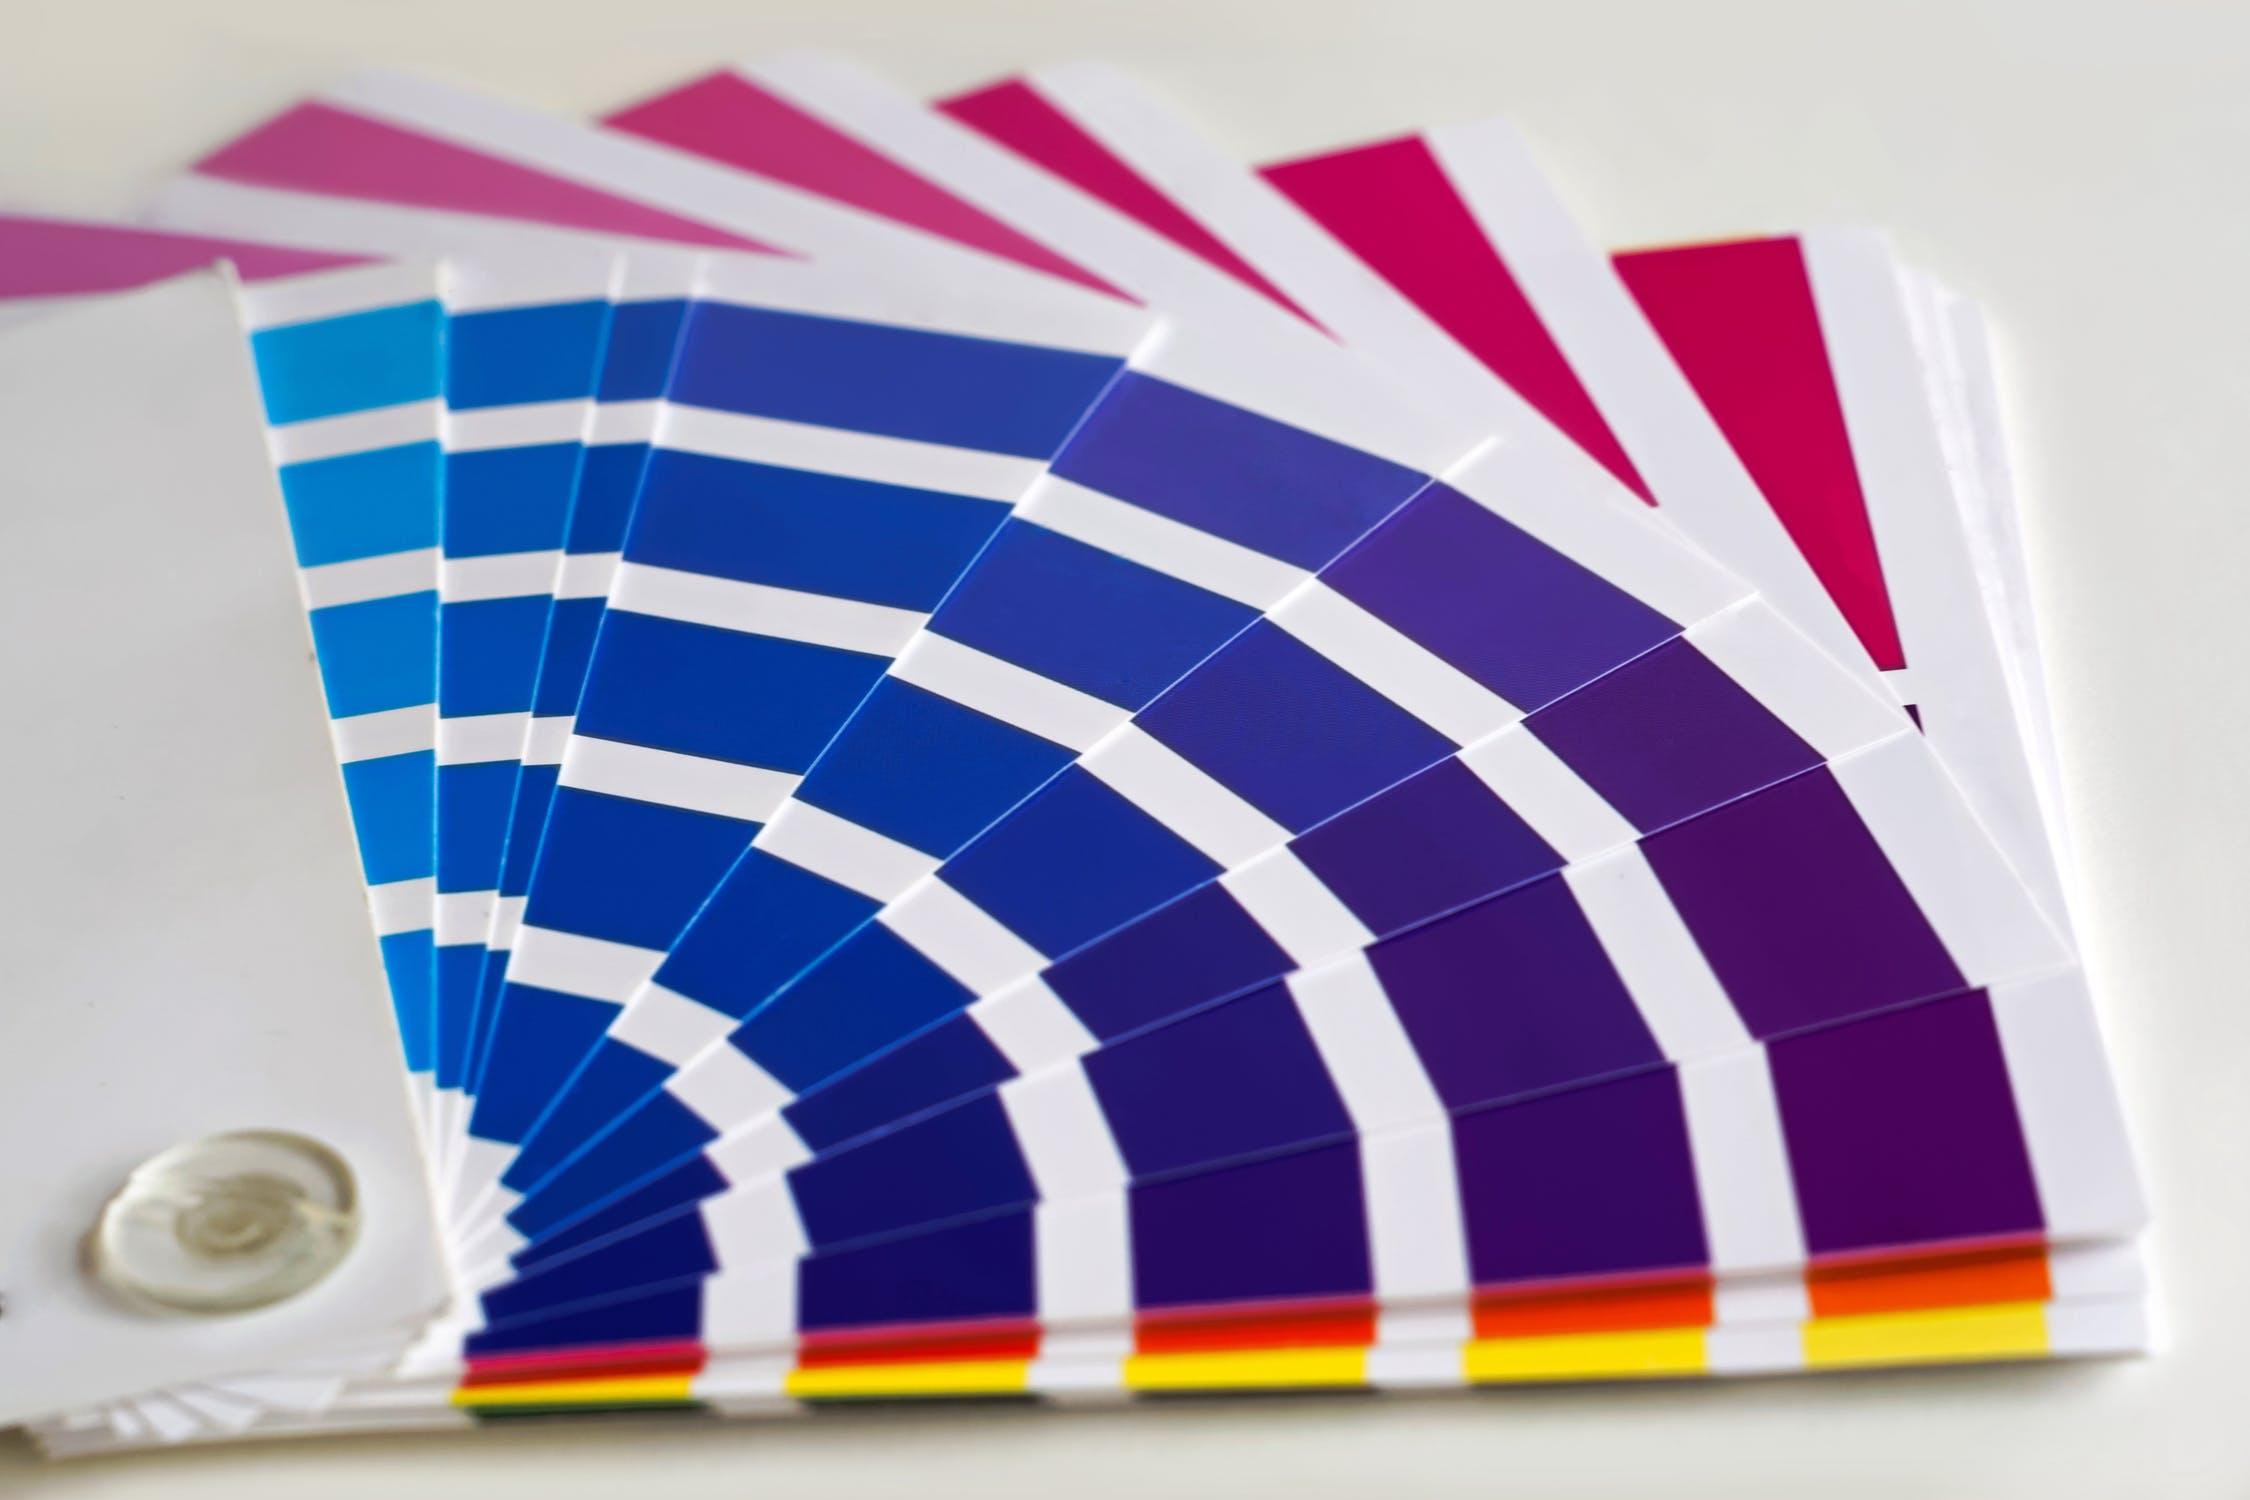 marketing consultancy, public relations services, retail print management